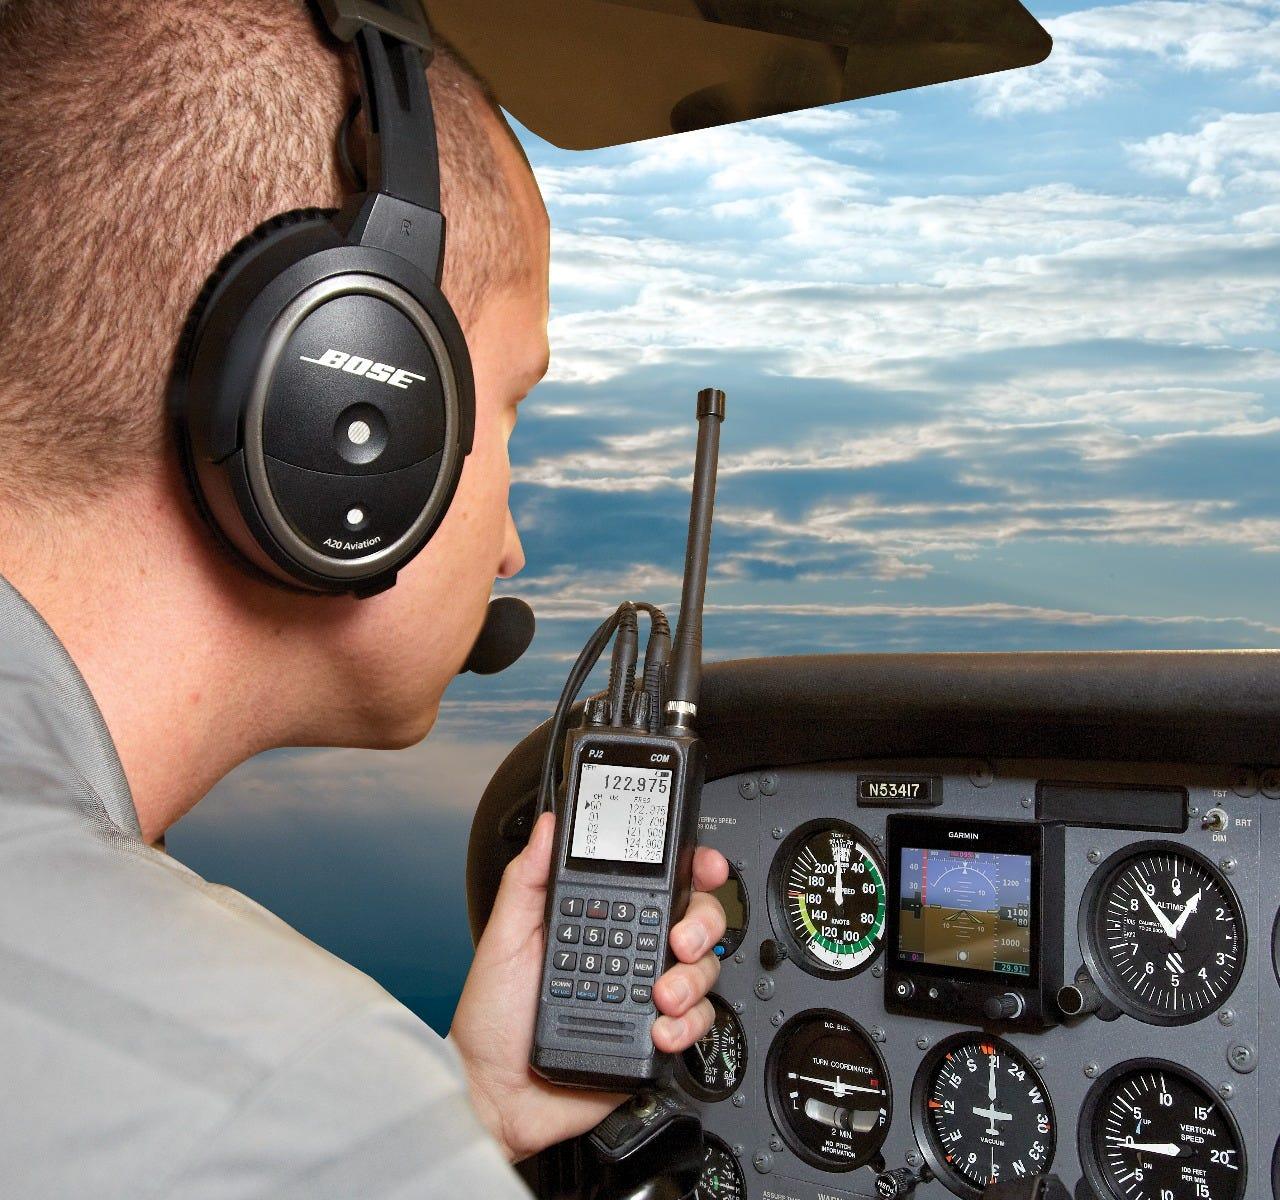 pilot using pj2